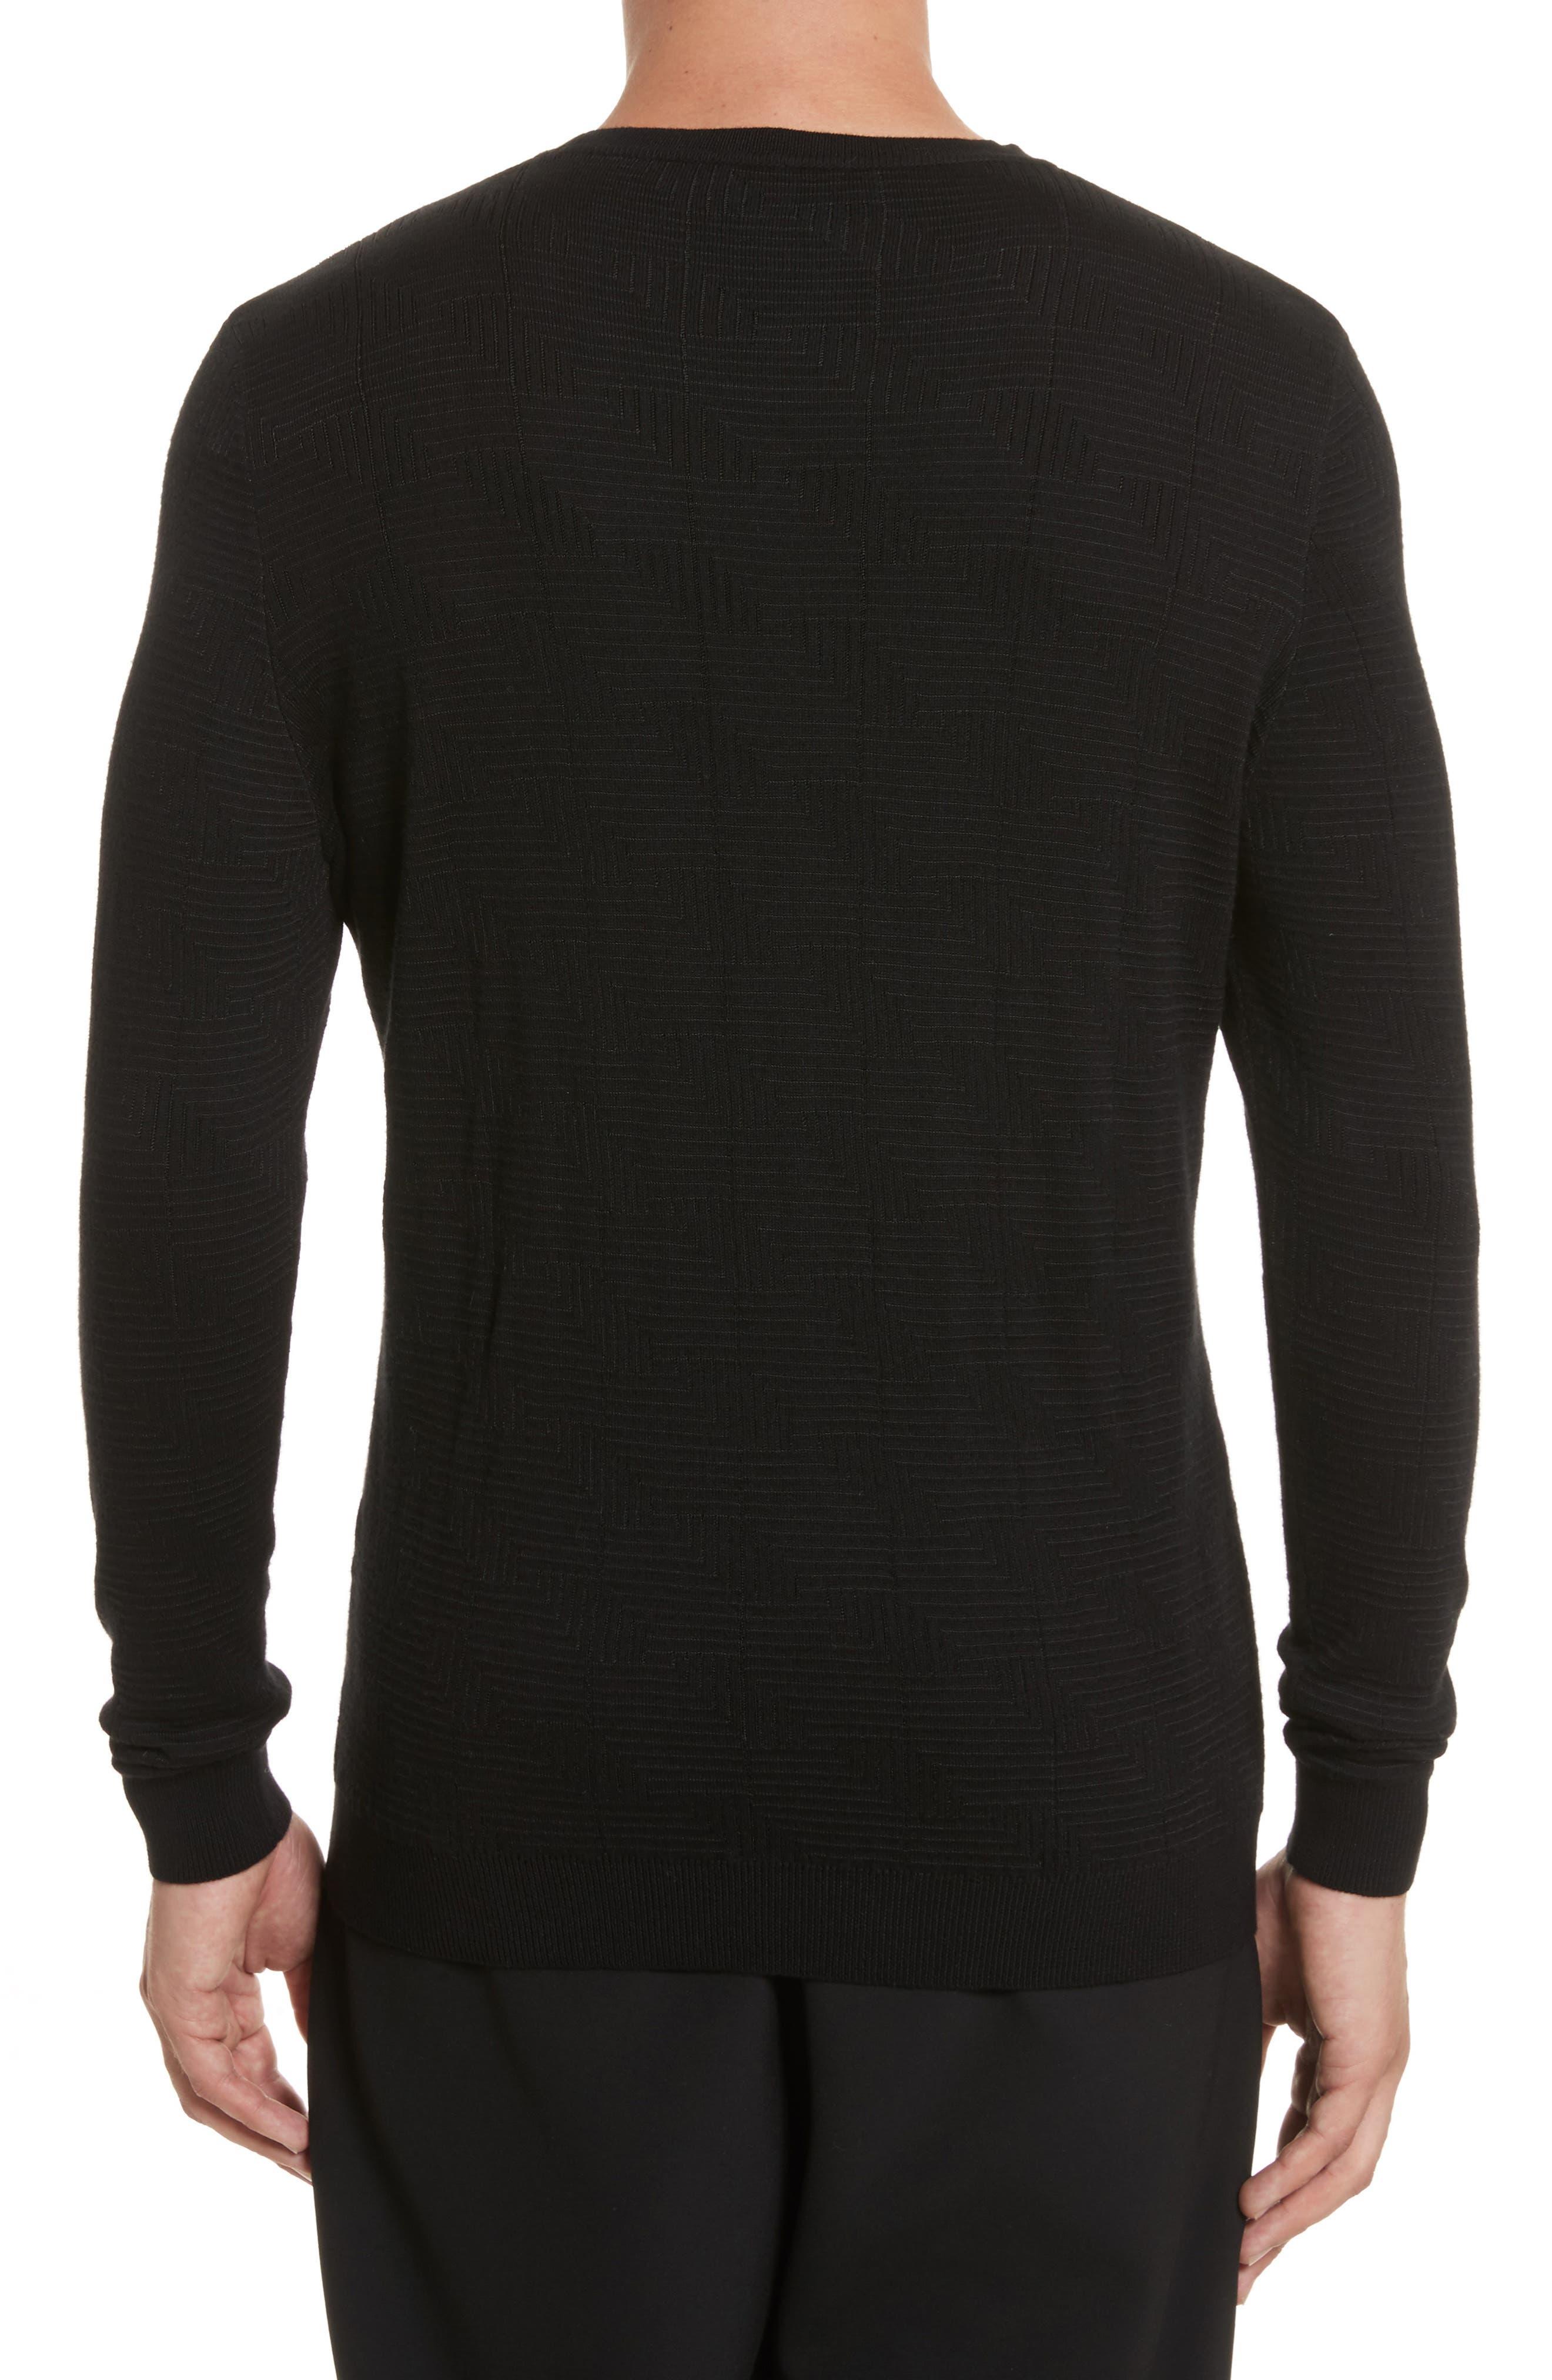 Frame Jacquard Sweater,                             Alternate thumbnail 2, color,                             001